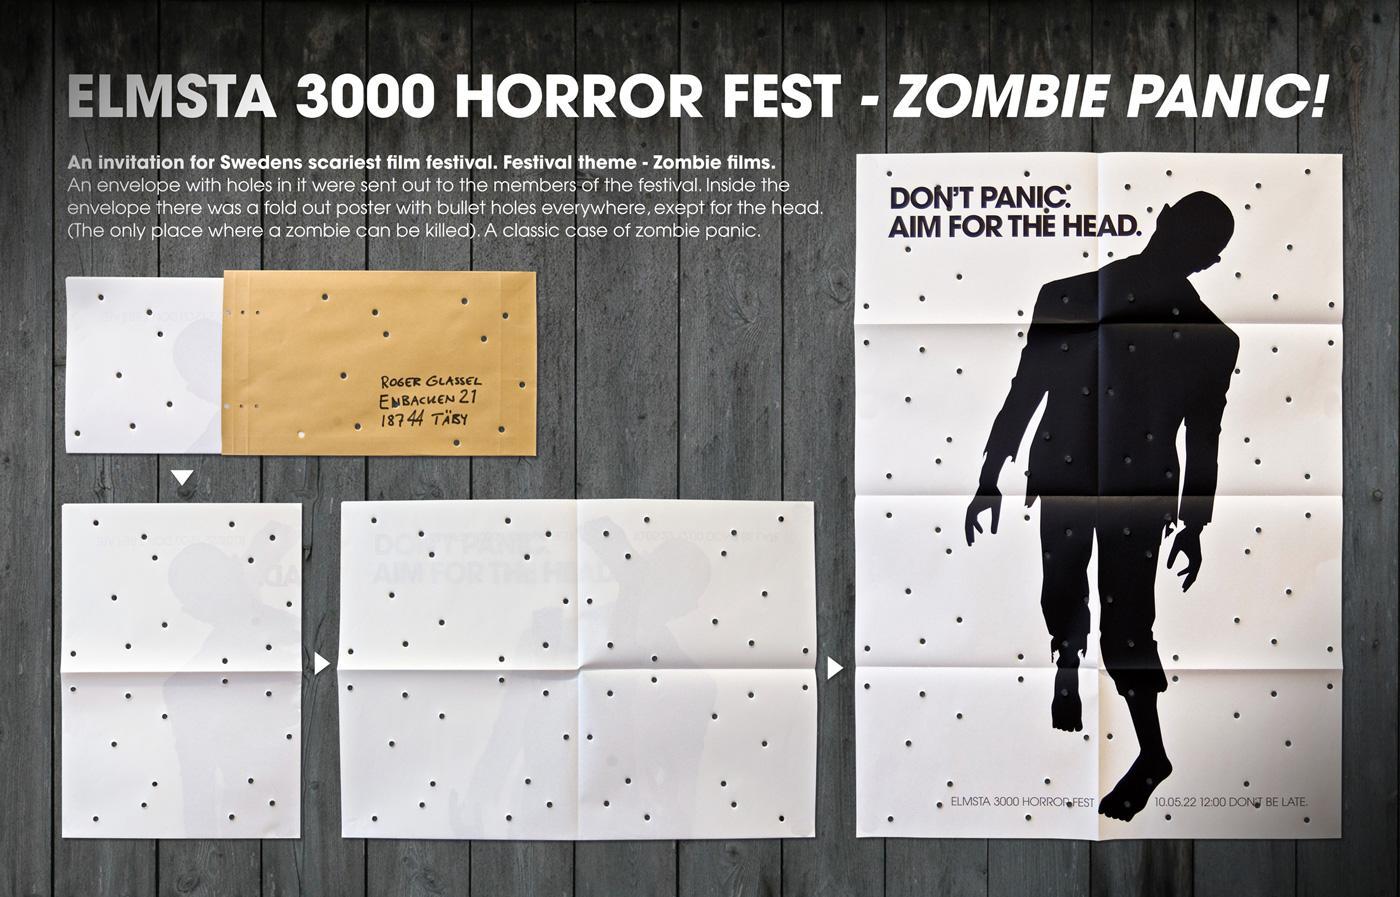 Elmsta 3000 Horror Fest Direct Ad -  Zombie Panic!